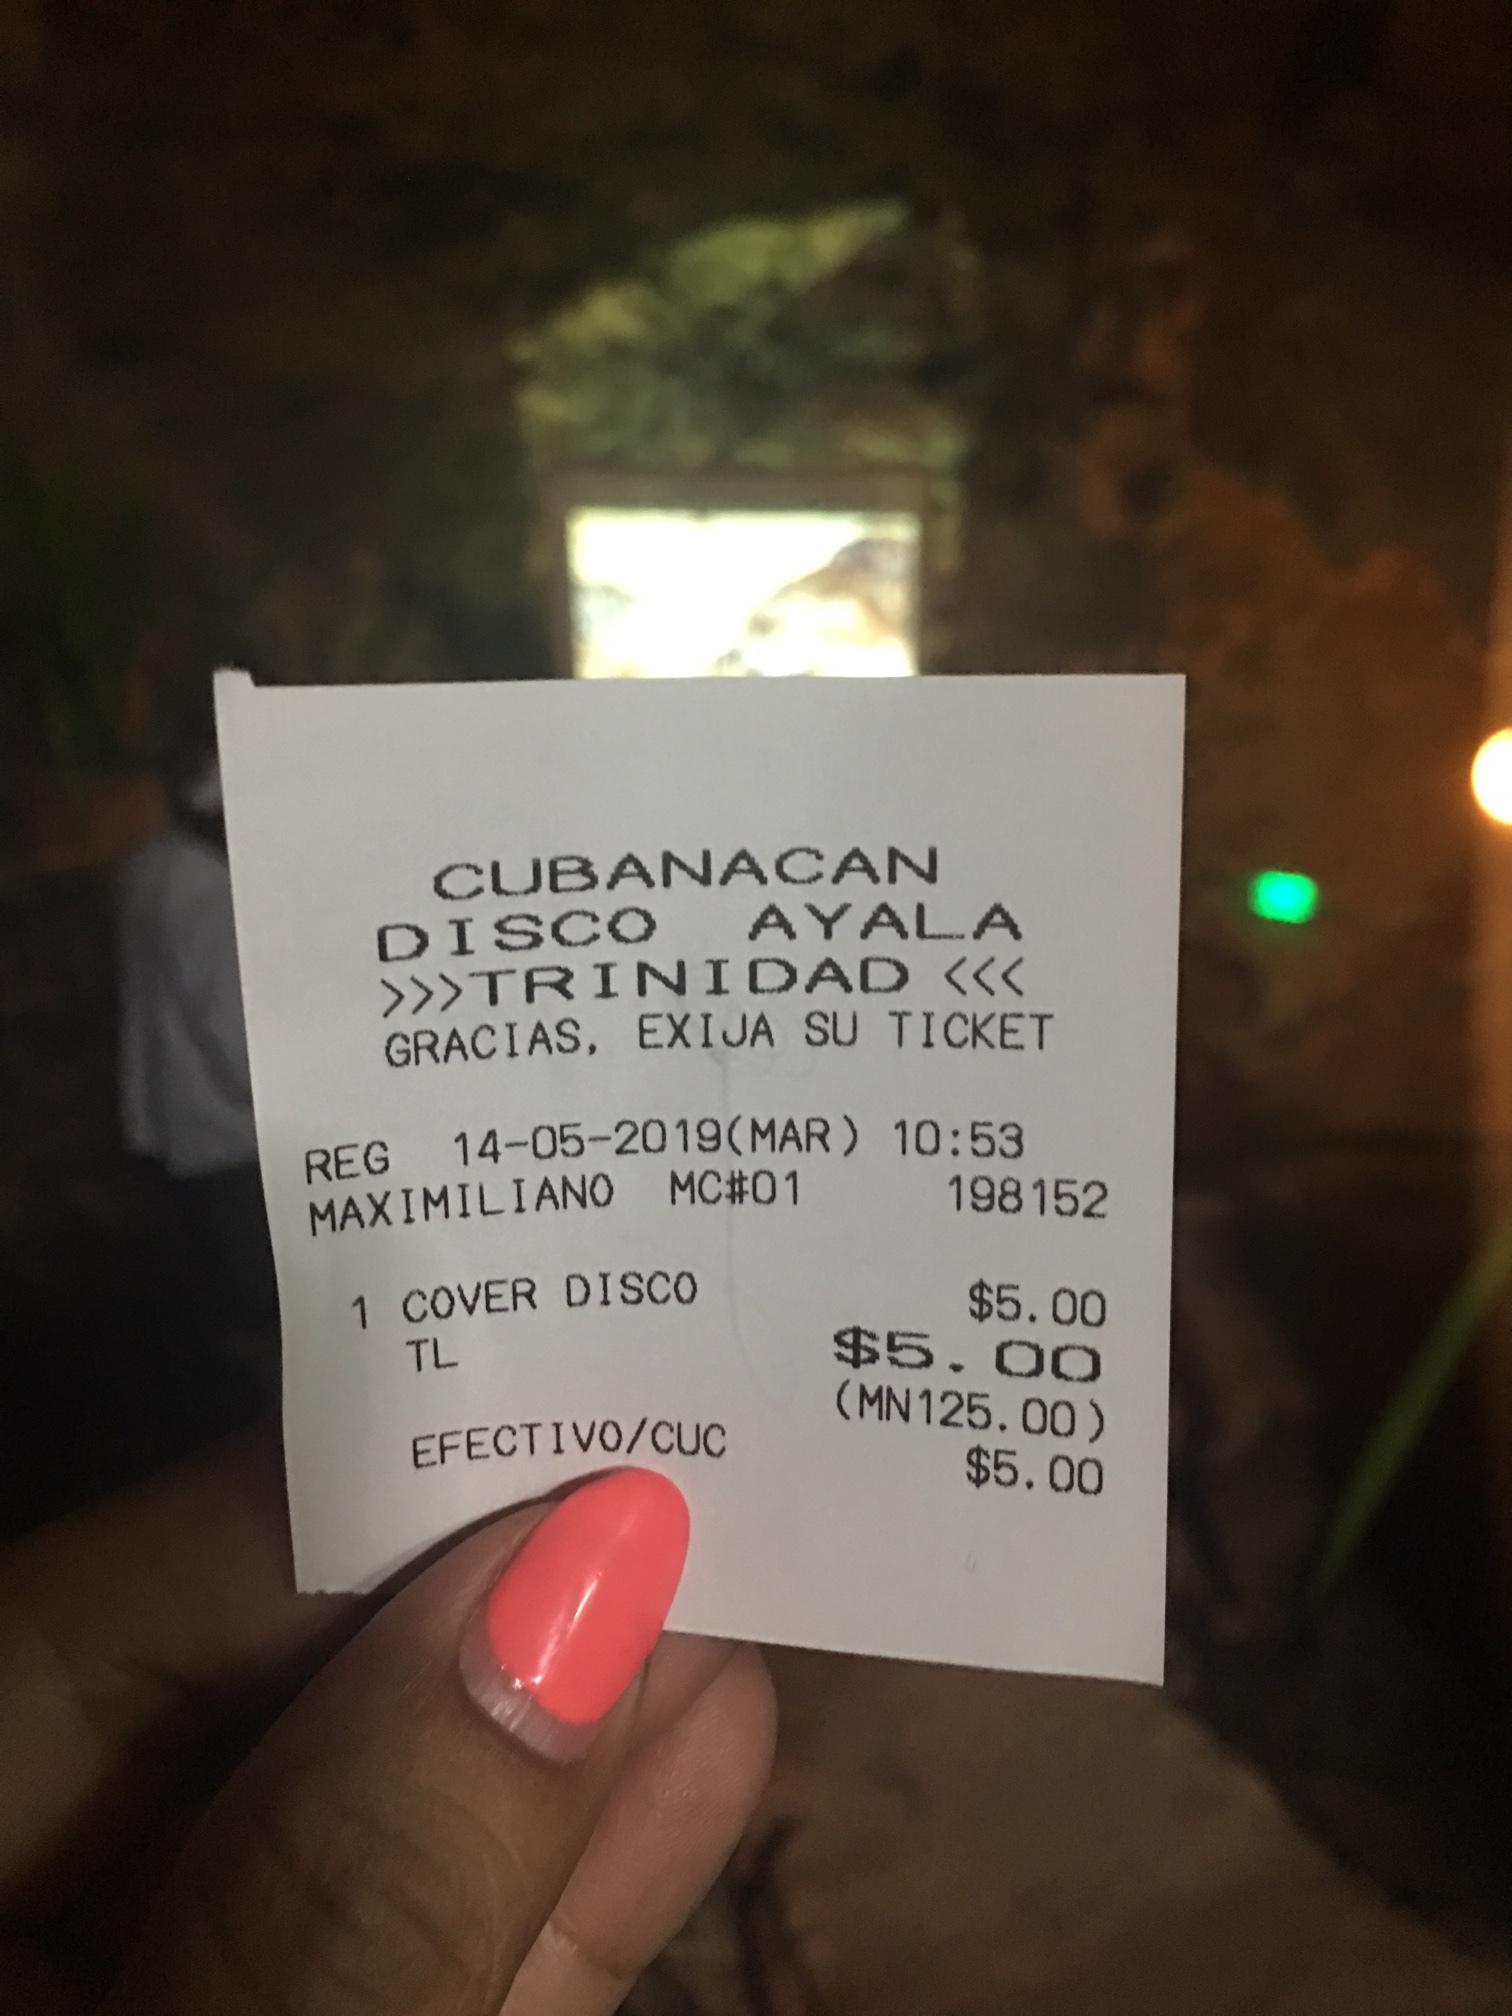 Receipt from Disco Ayala, Trinidad, Cuba